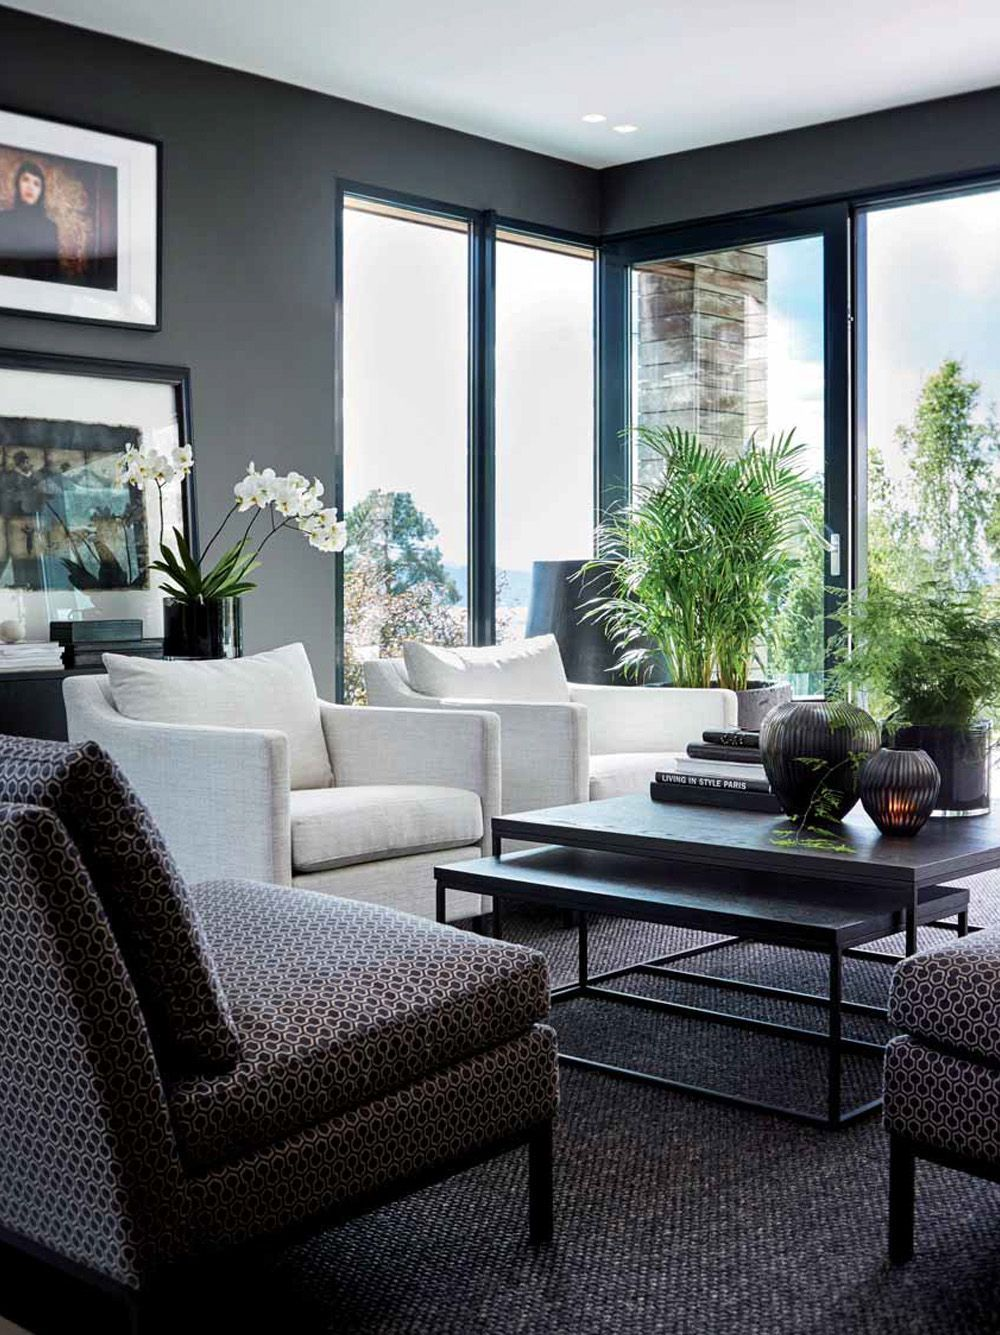 hotel vincci centrum madrid contemporary home decor on modern kitchen design that will inspire your luxury interior essential elements id=15584